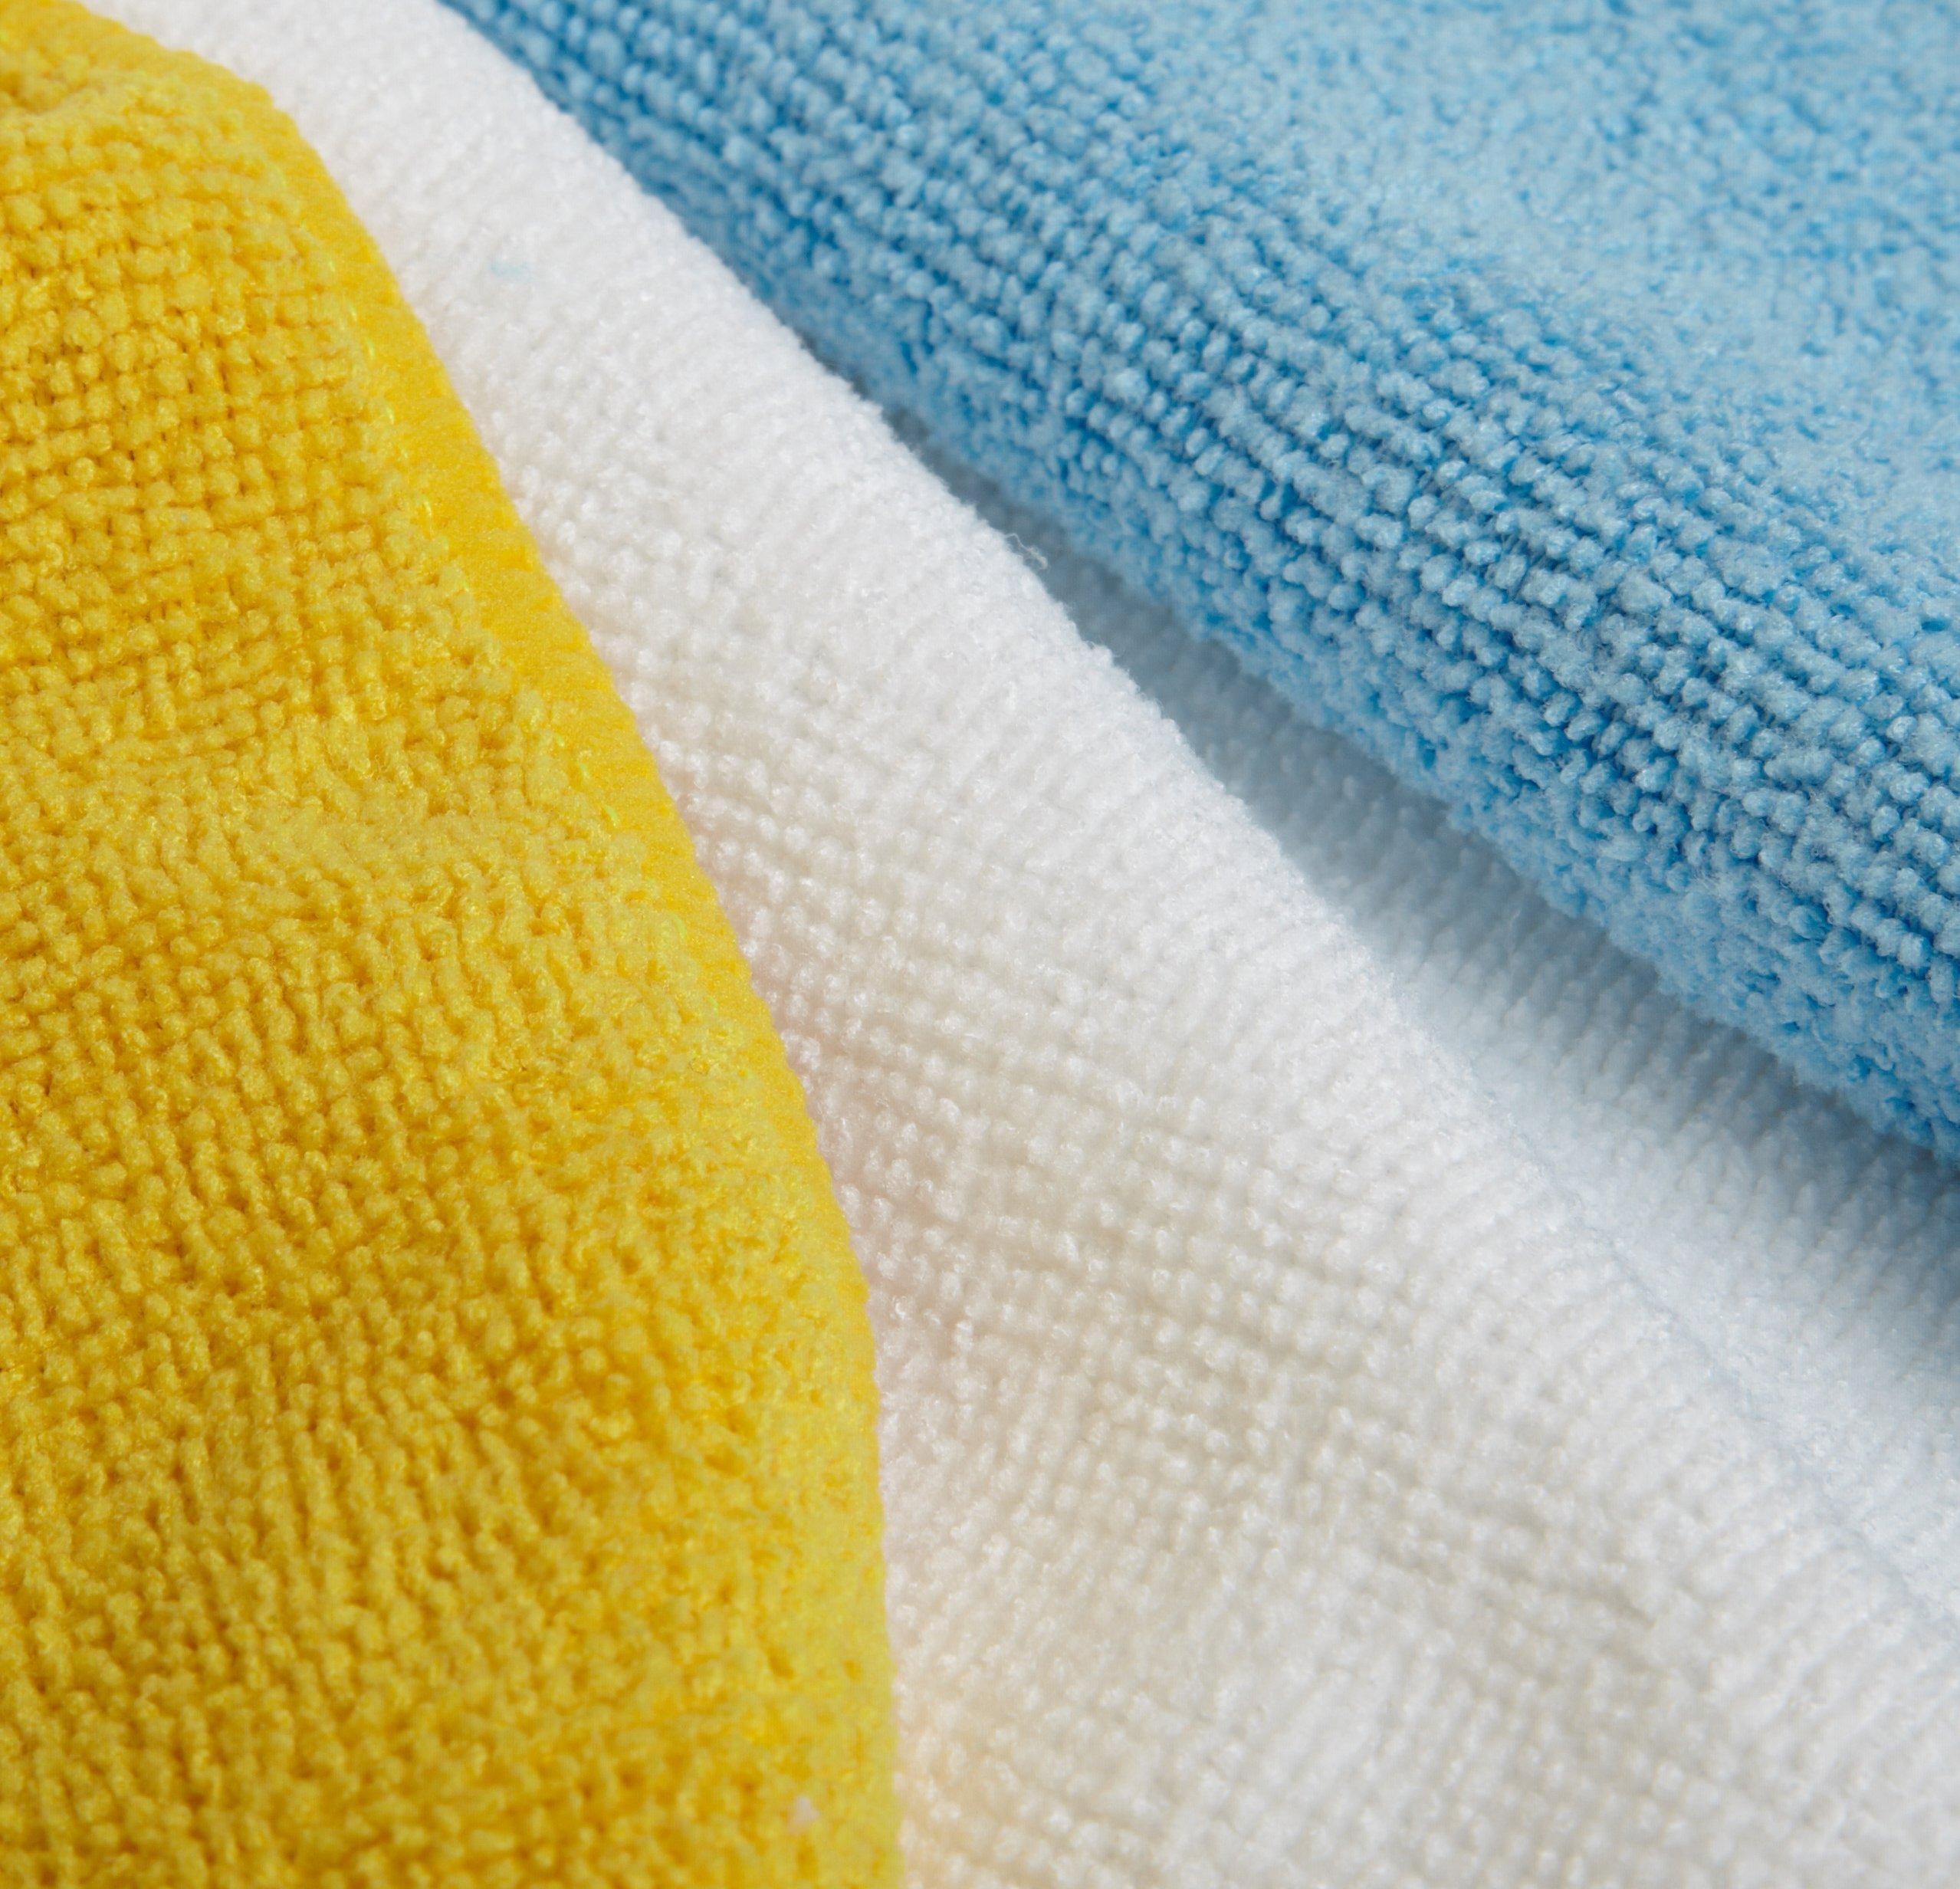 Microfiber Cloth Manufacturers Uk: AmazonBasics Microfiber Cleaning Cloth